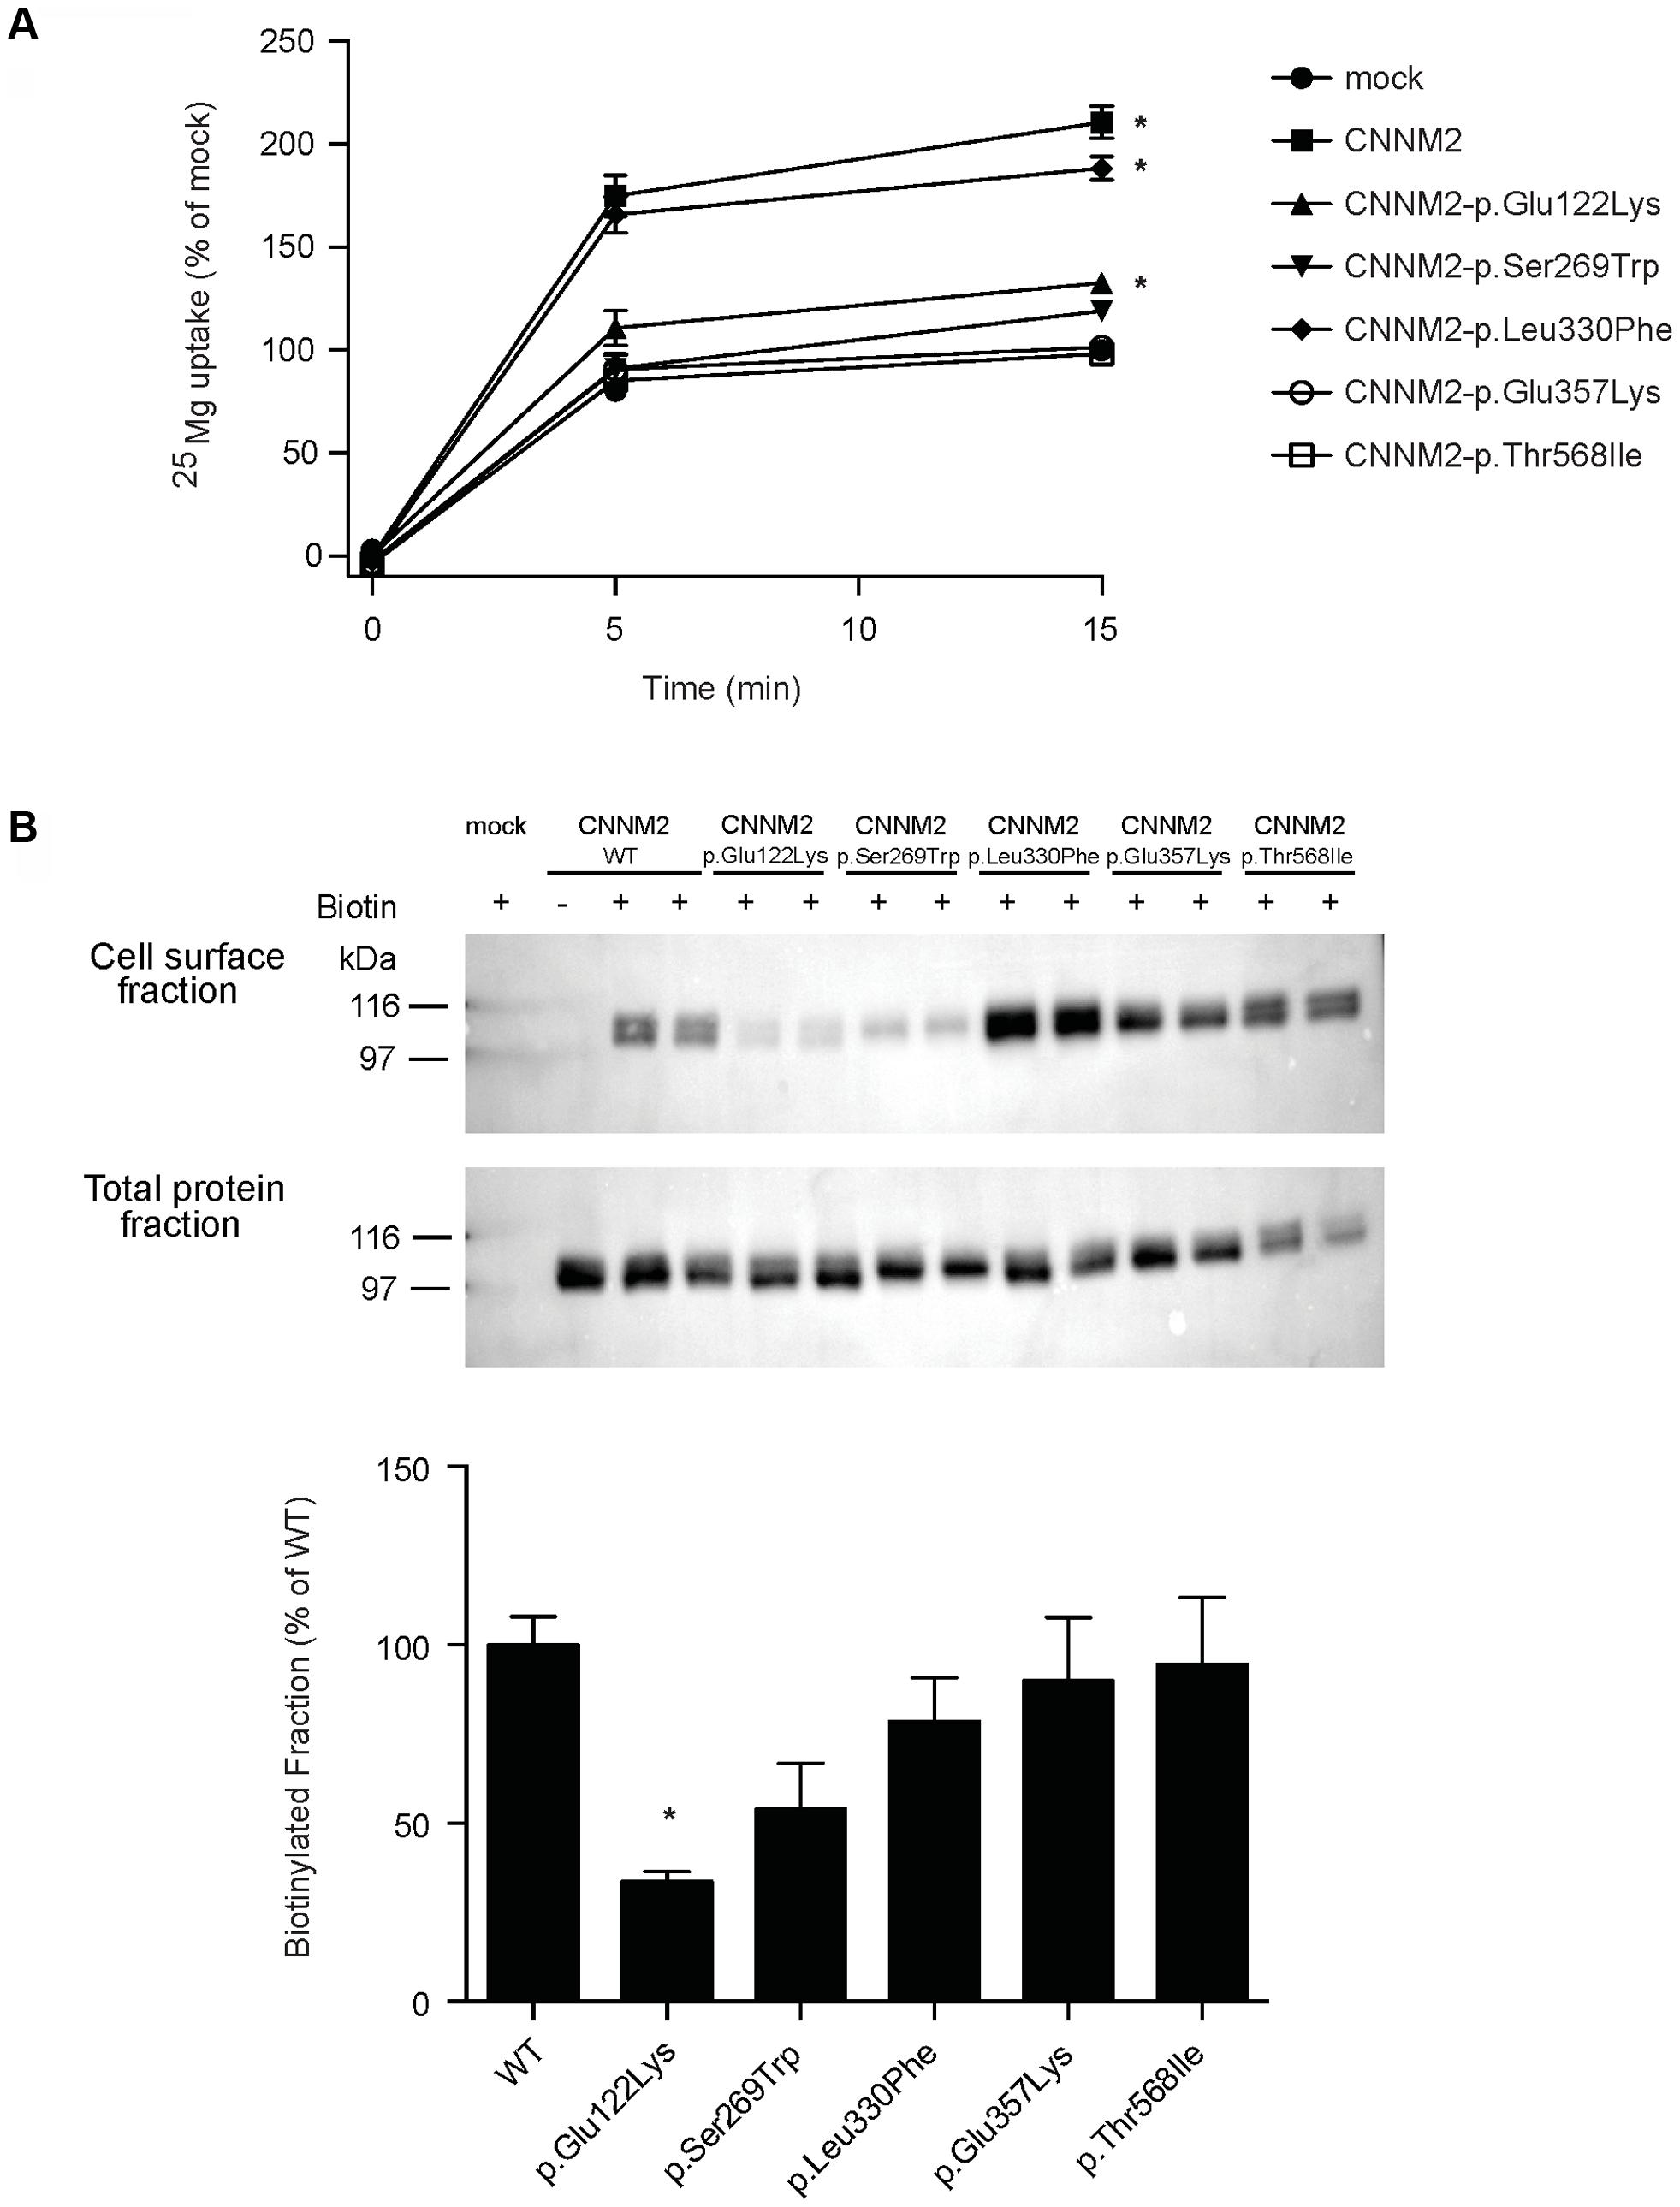 CNNM2 mutations impair Mg<sup>2+</sup> uptake in HEK293 cells.